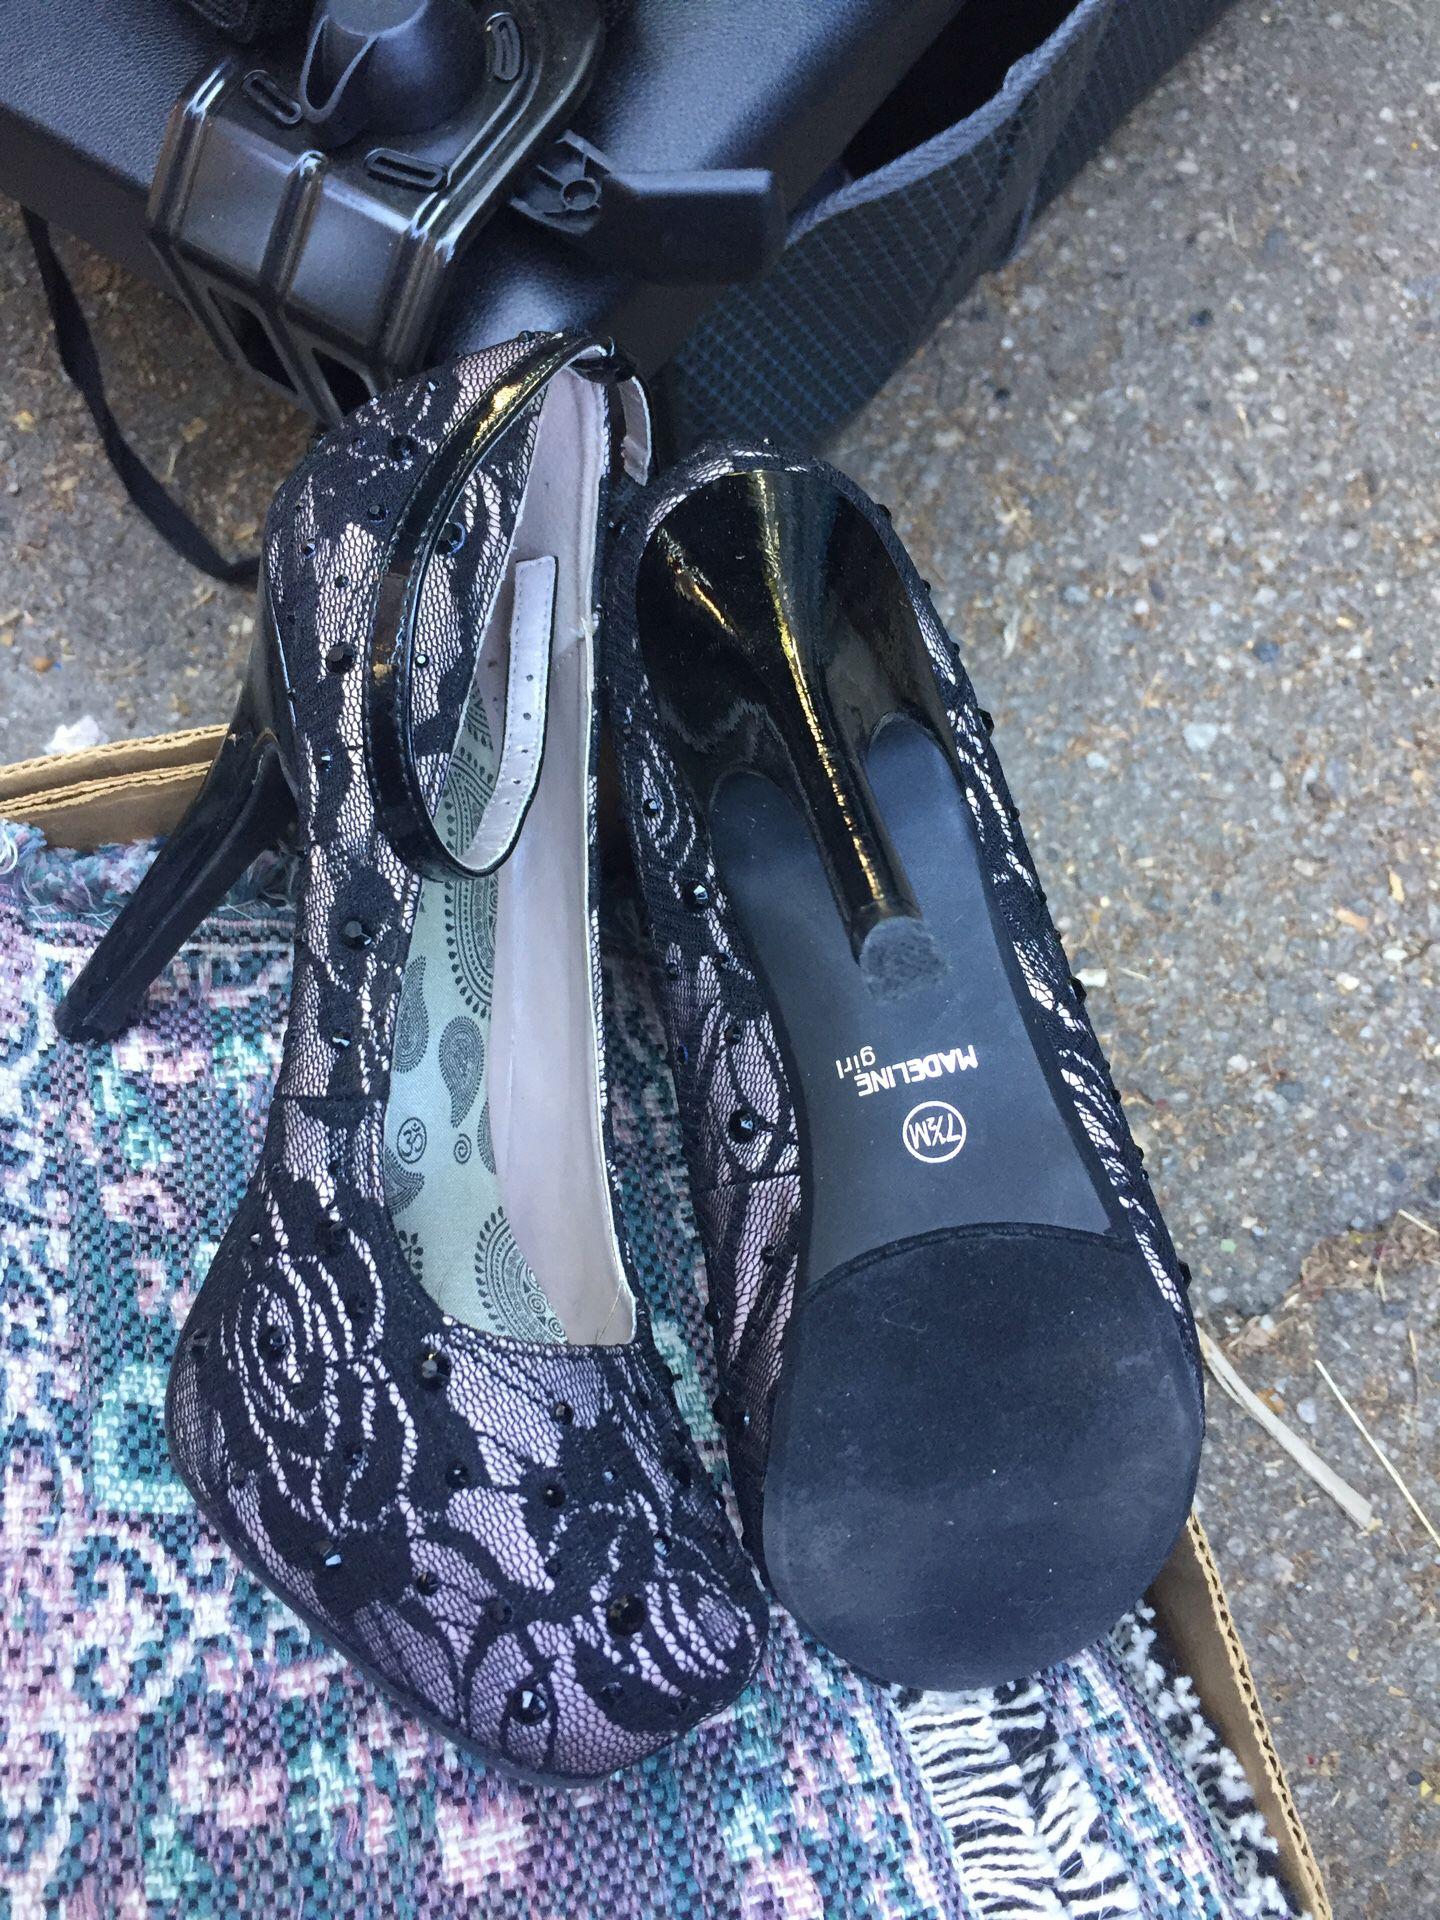 Madeline girl high heal shoes 👠